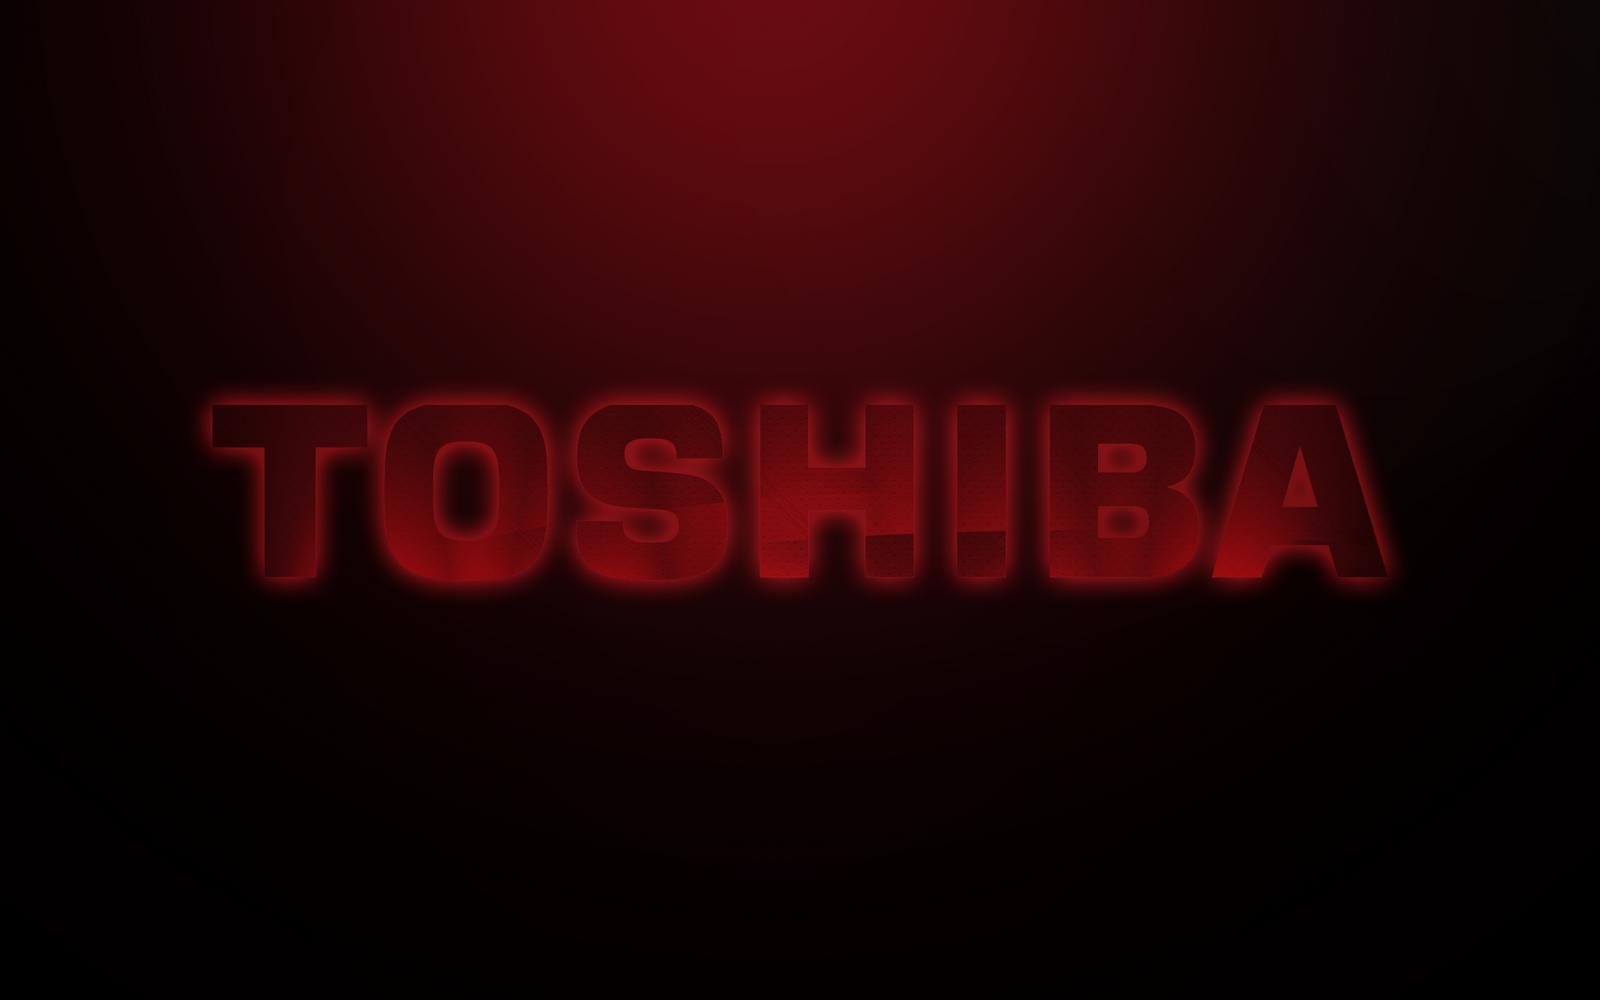 best wallpaper of toshiba logo hd new best wallpapers